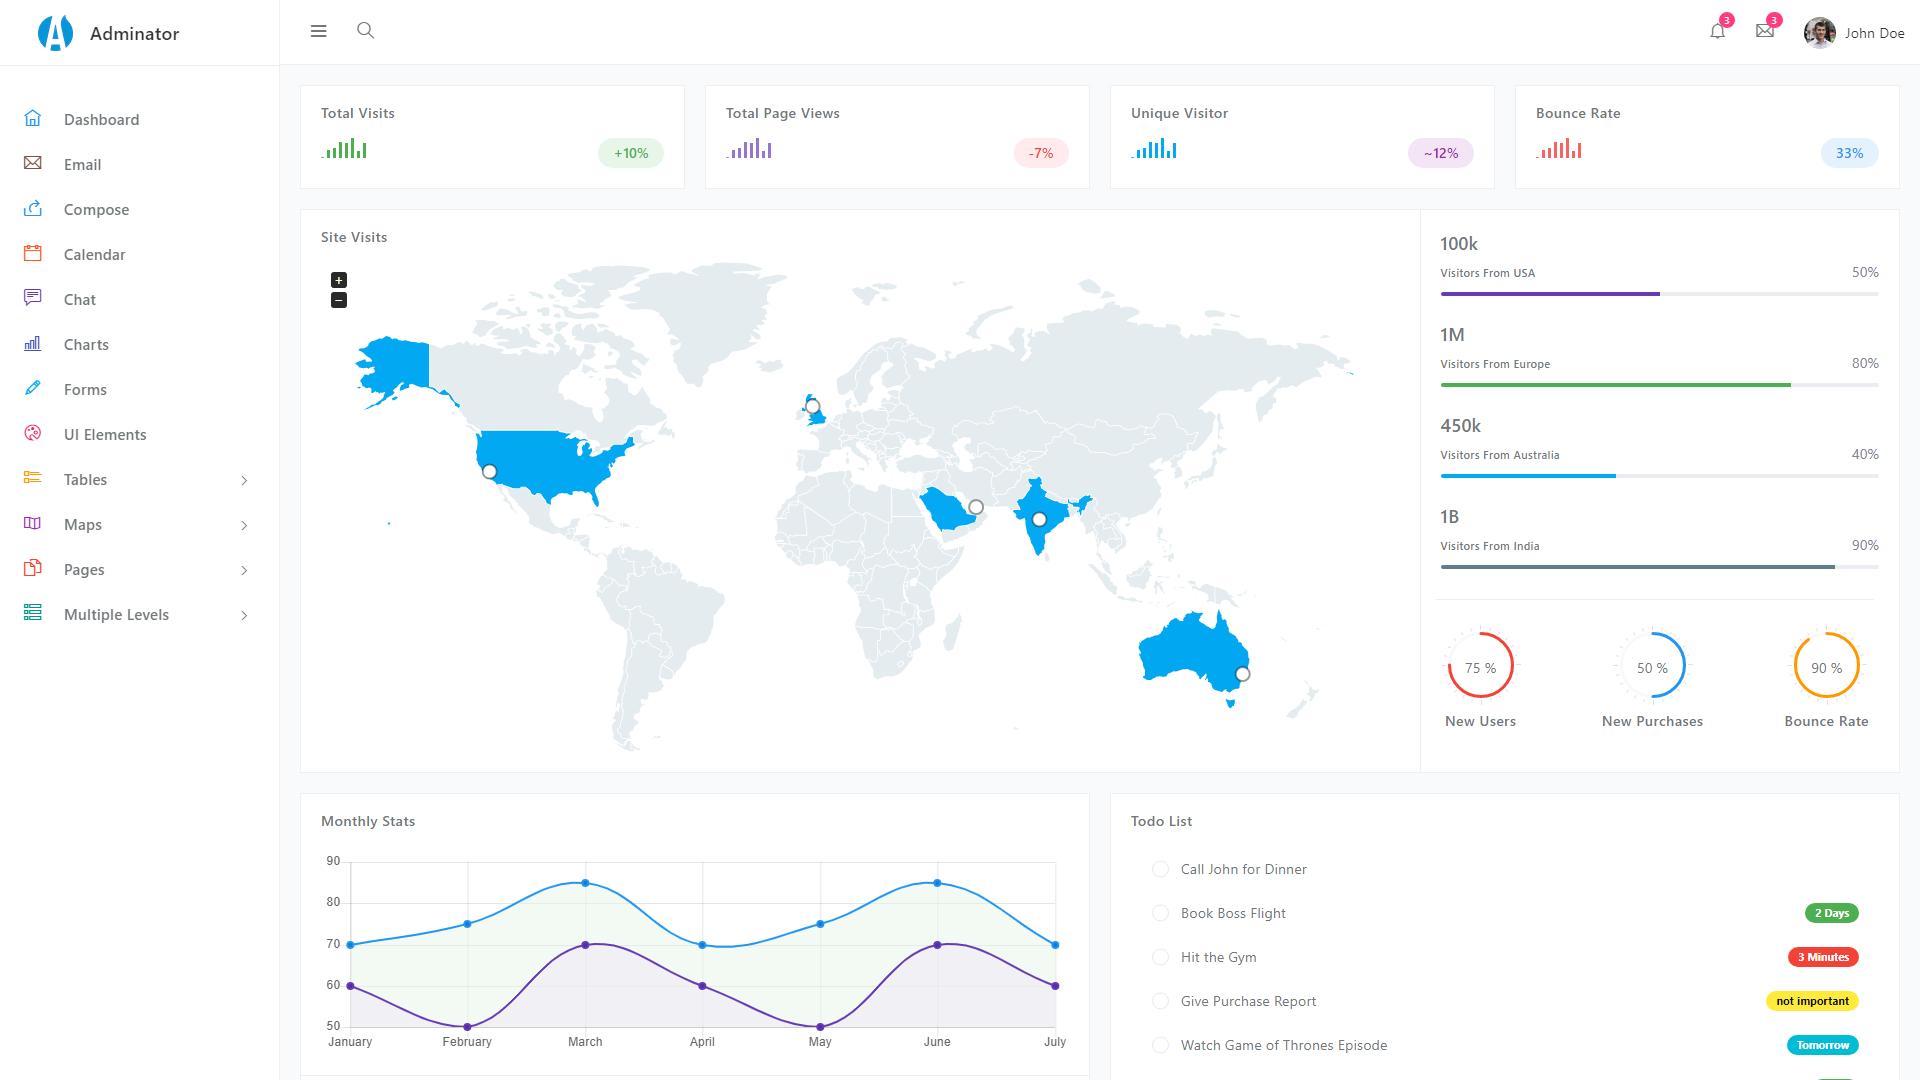 Adminator Bootstrap Admin Template Github